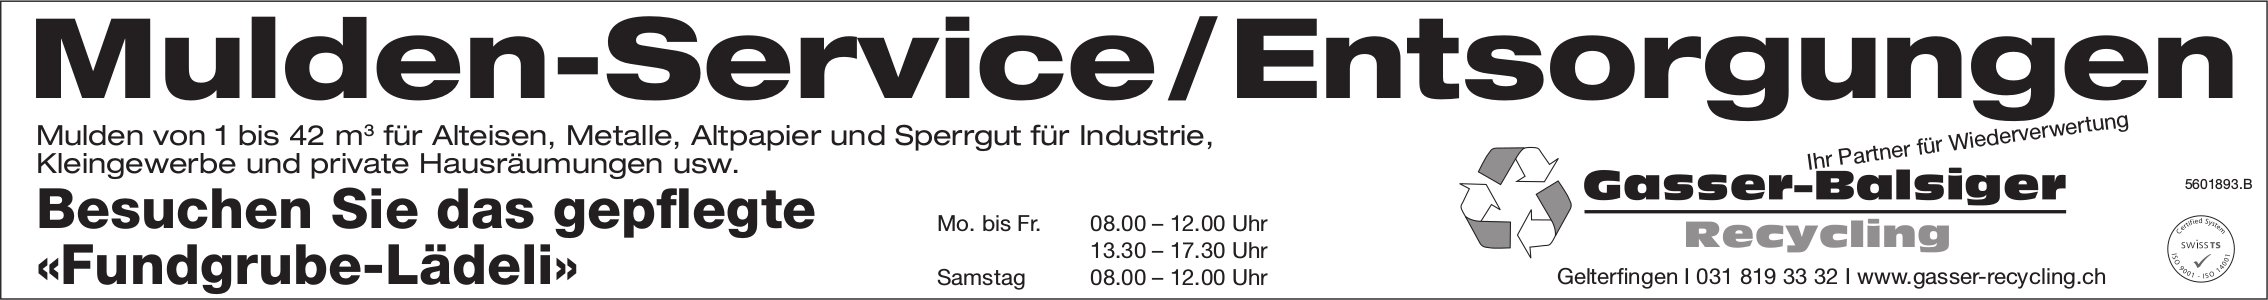 Gasser-Balsiger Recycling, Gelterfingen - Mulden-Service/Entsorgungen